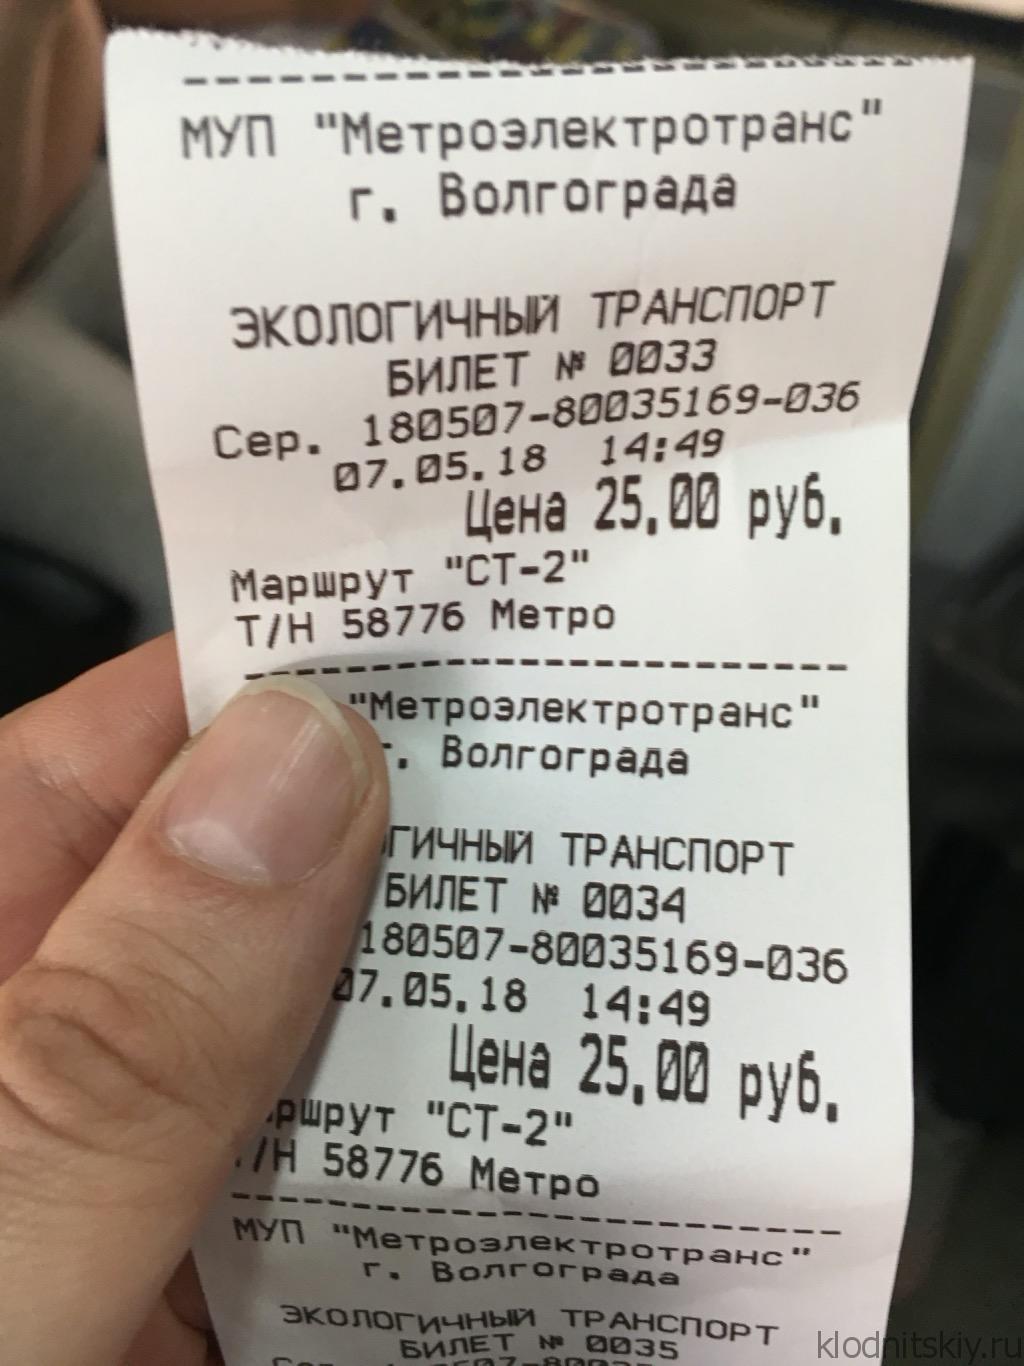 Автопутешествие Москва - Волгоград. Метротрам.